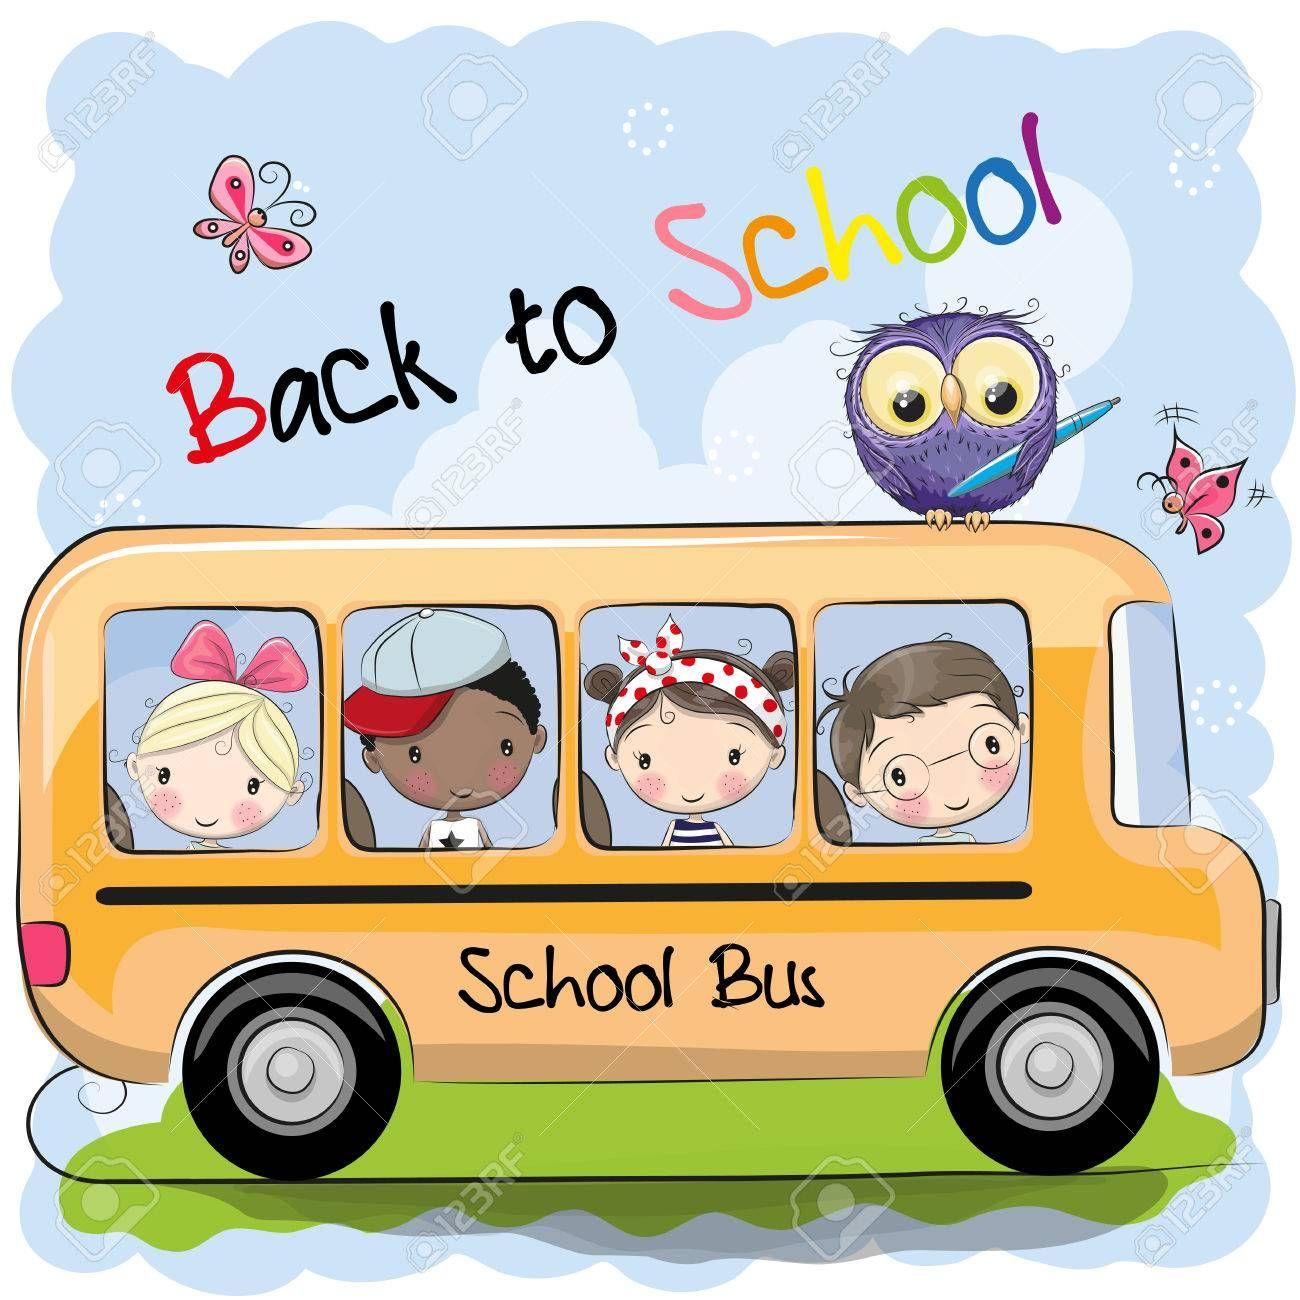 School Bus And Four Cute Cartoon Kids And Owl Affiliate Cute